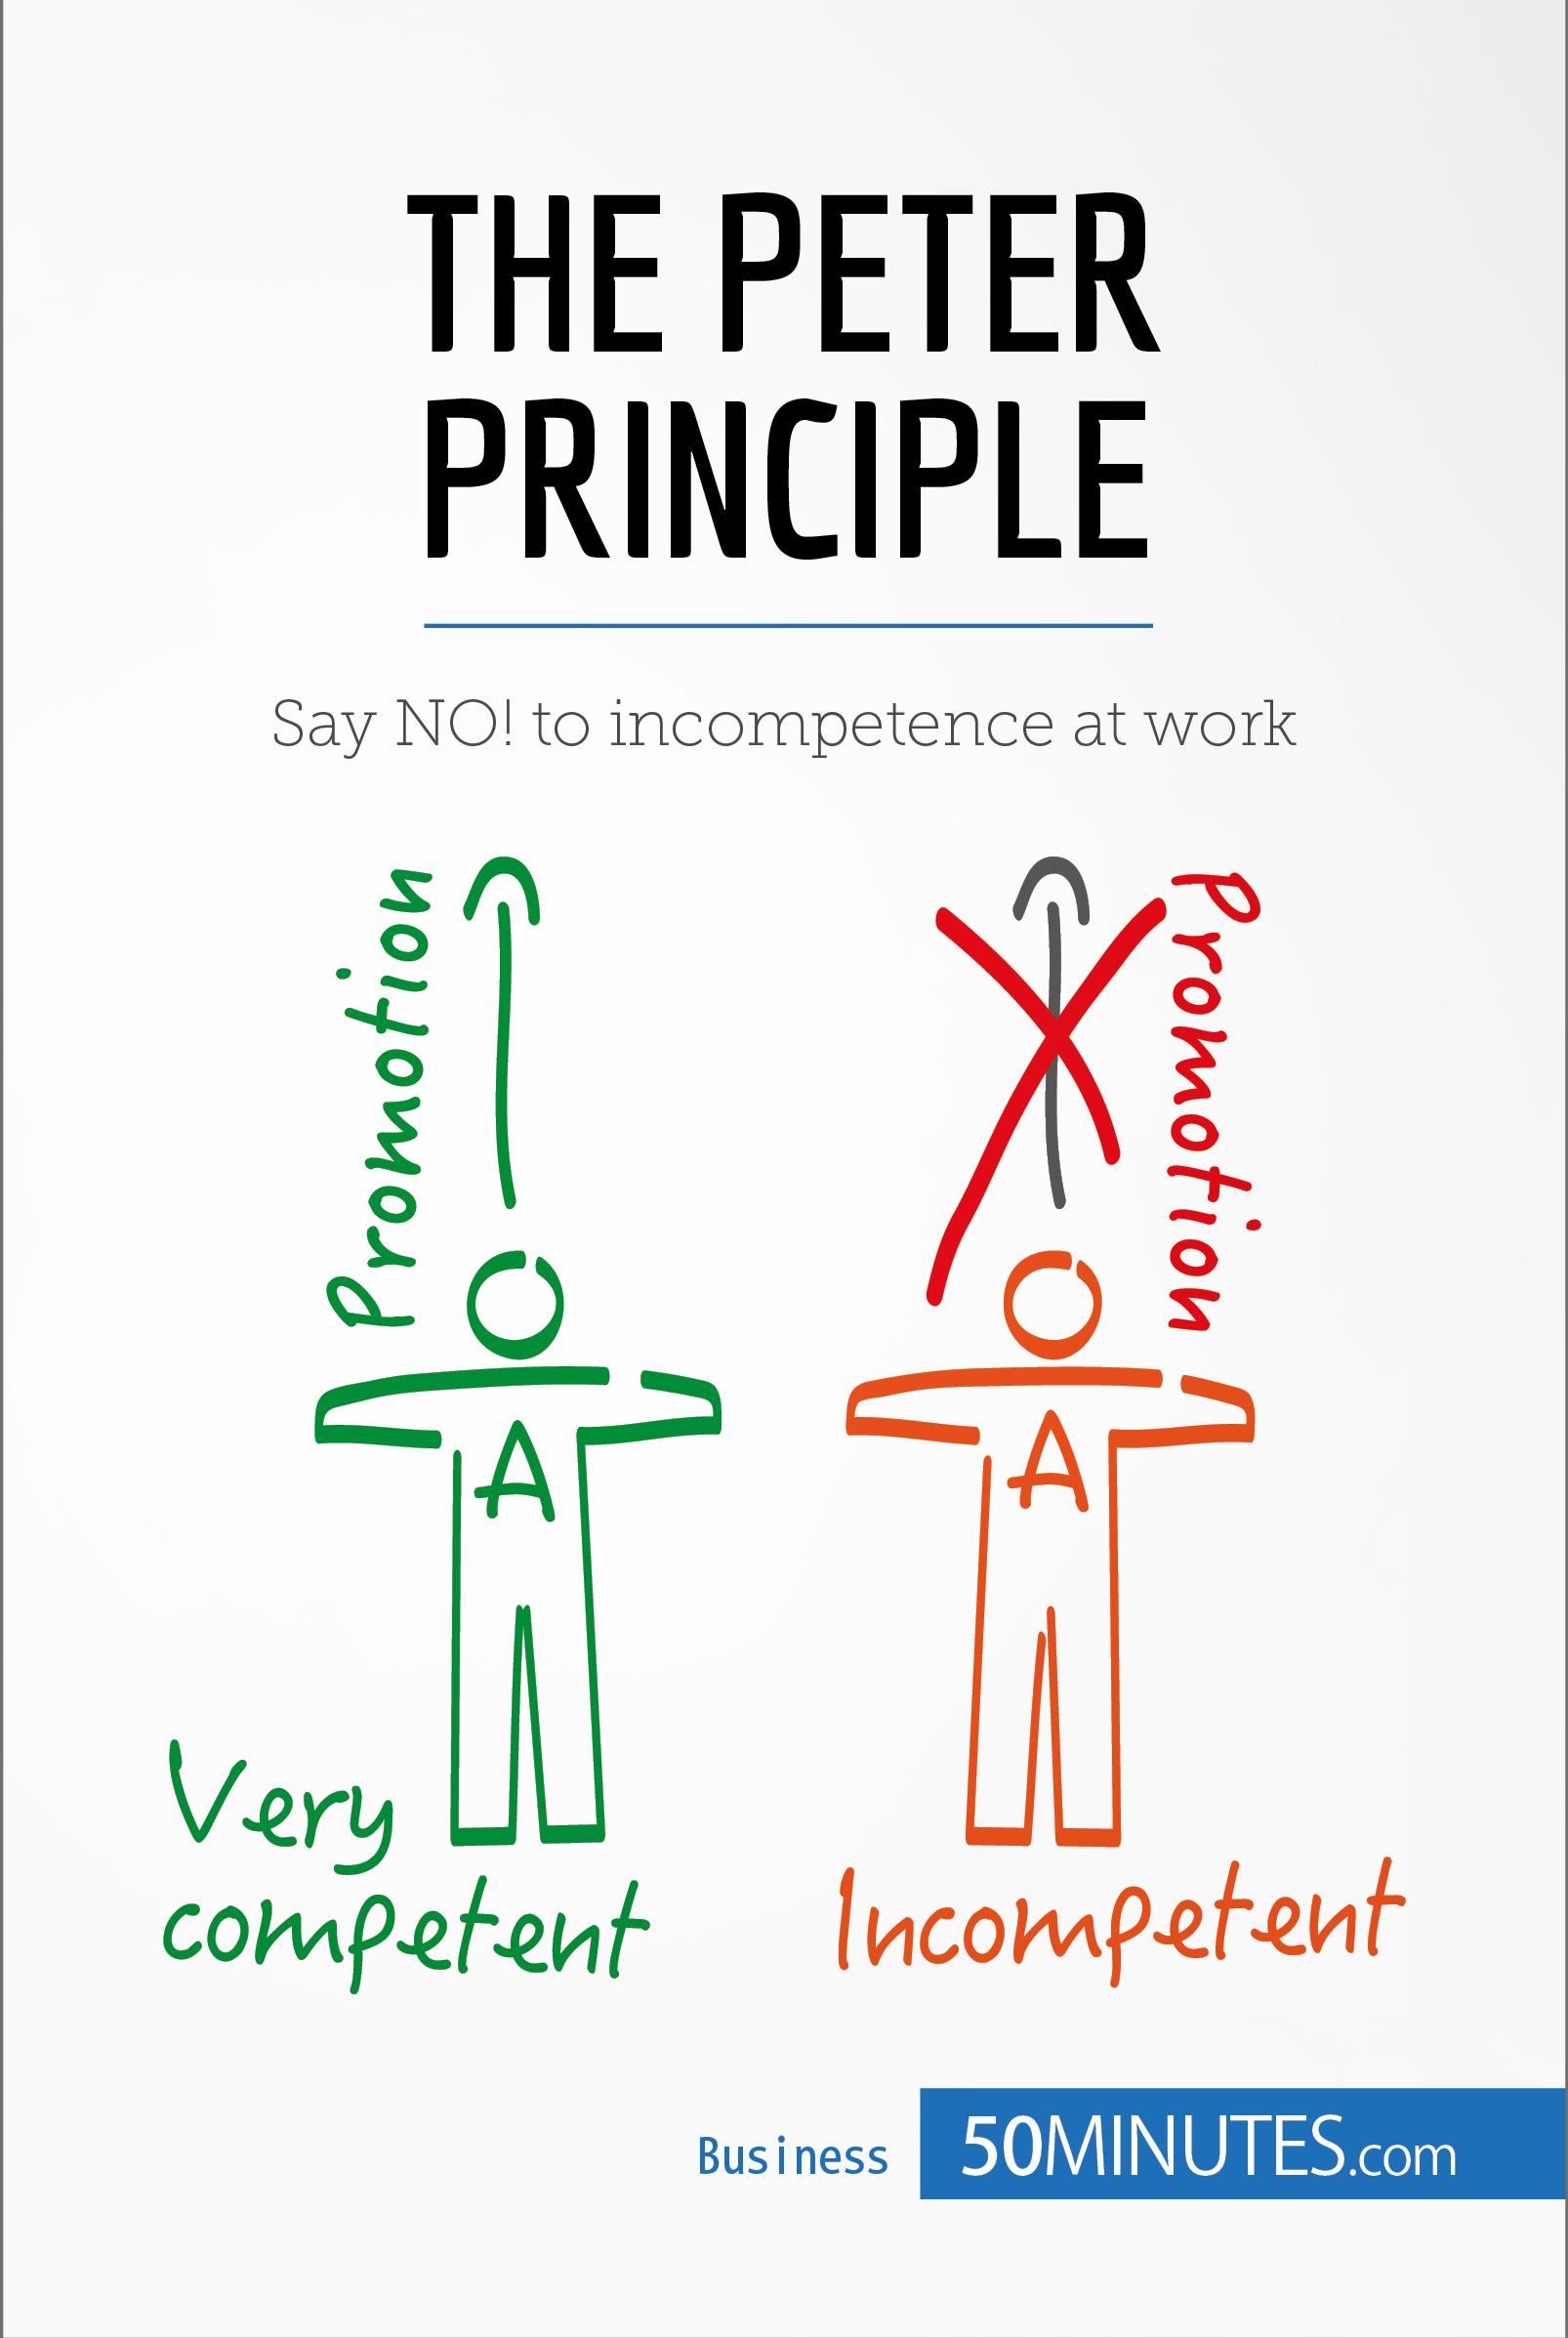 The Peter Principle